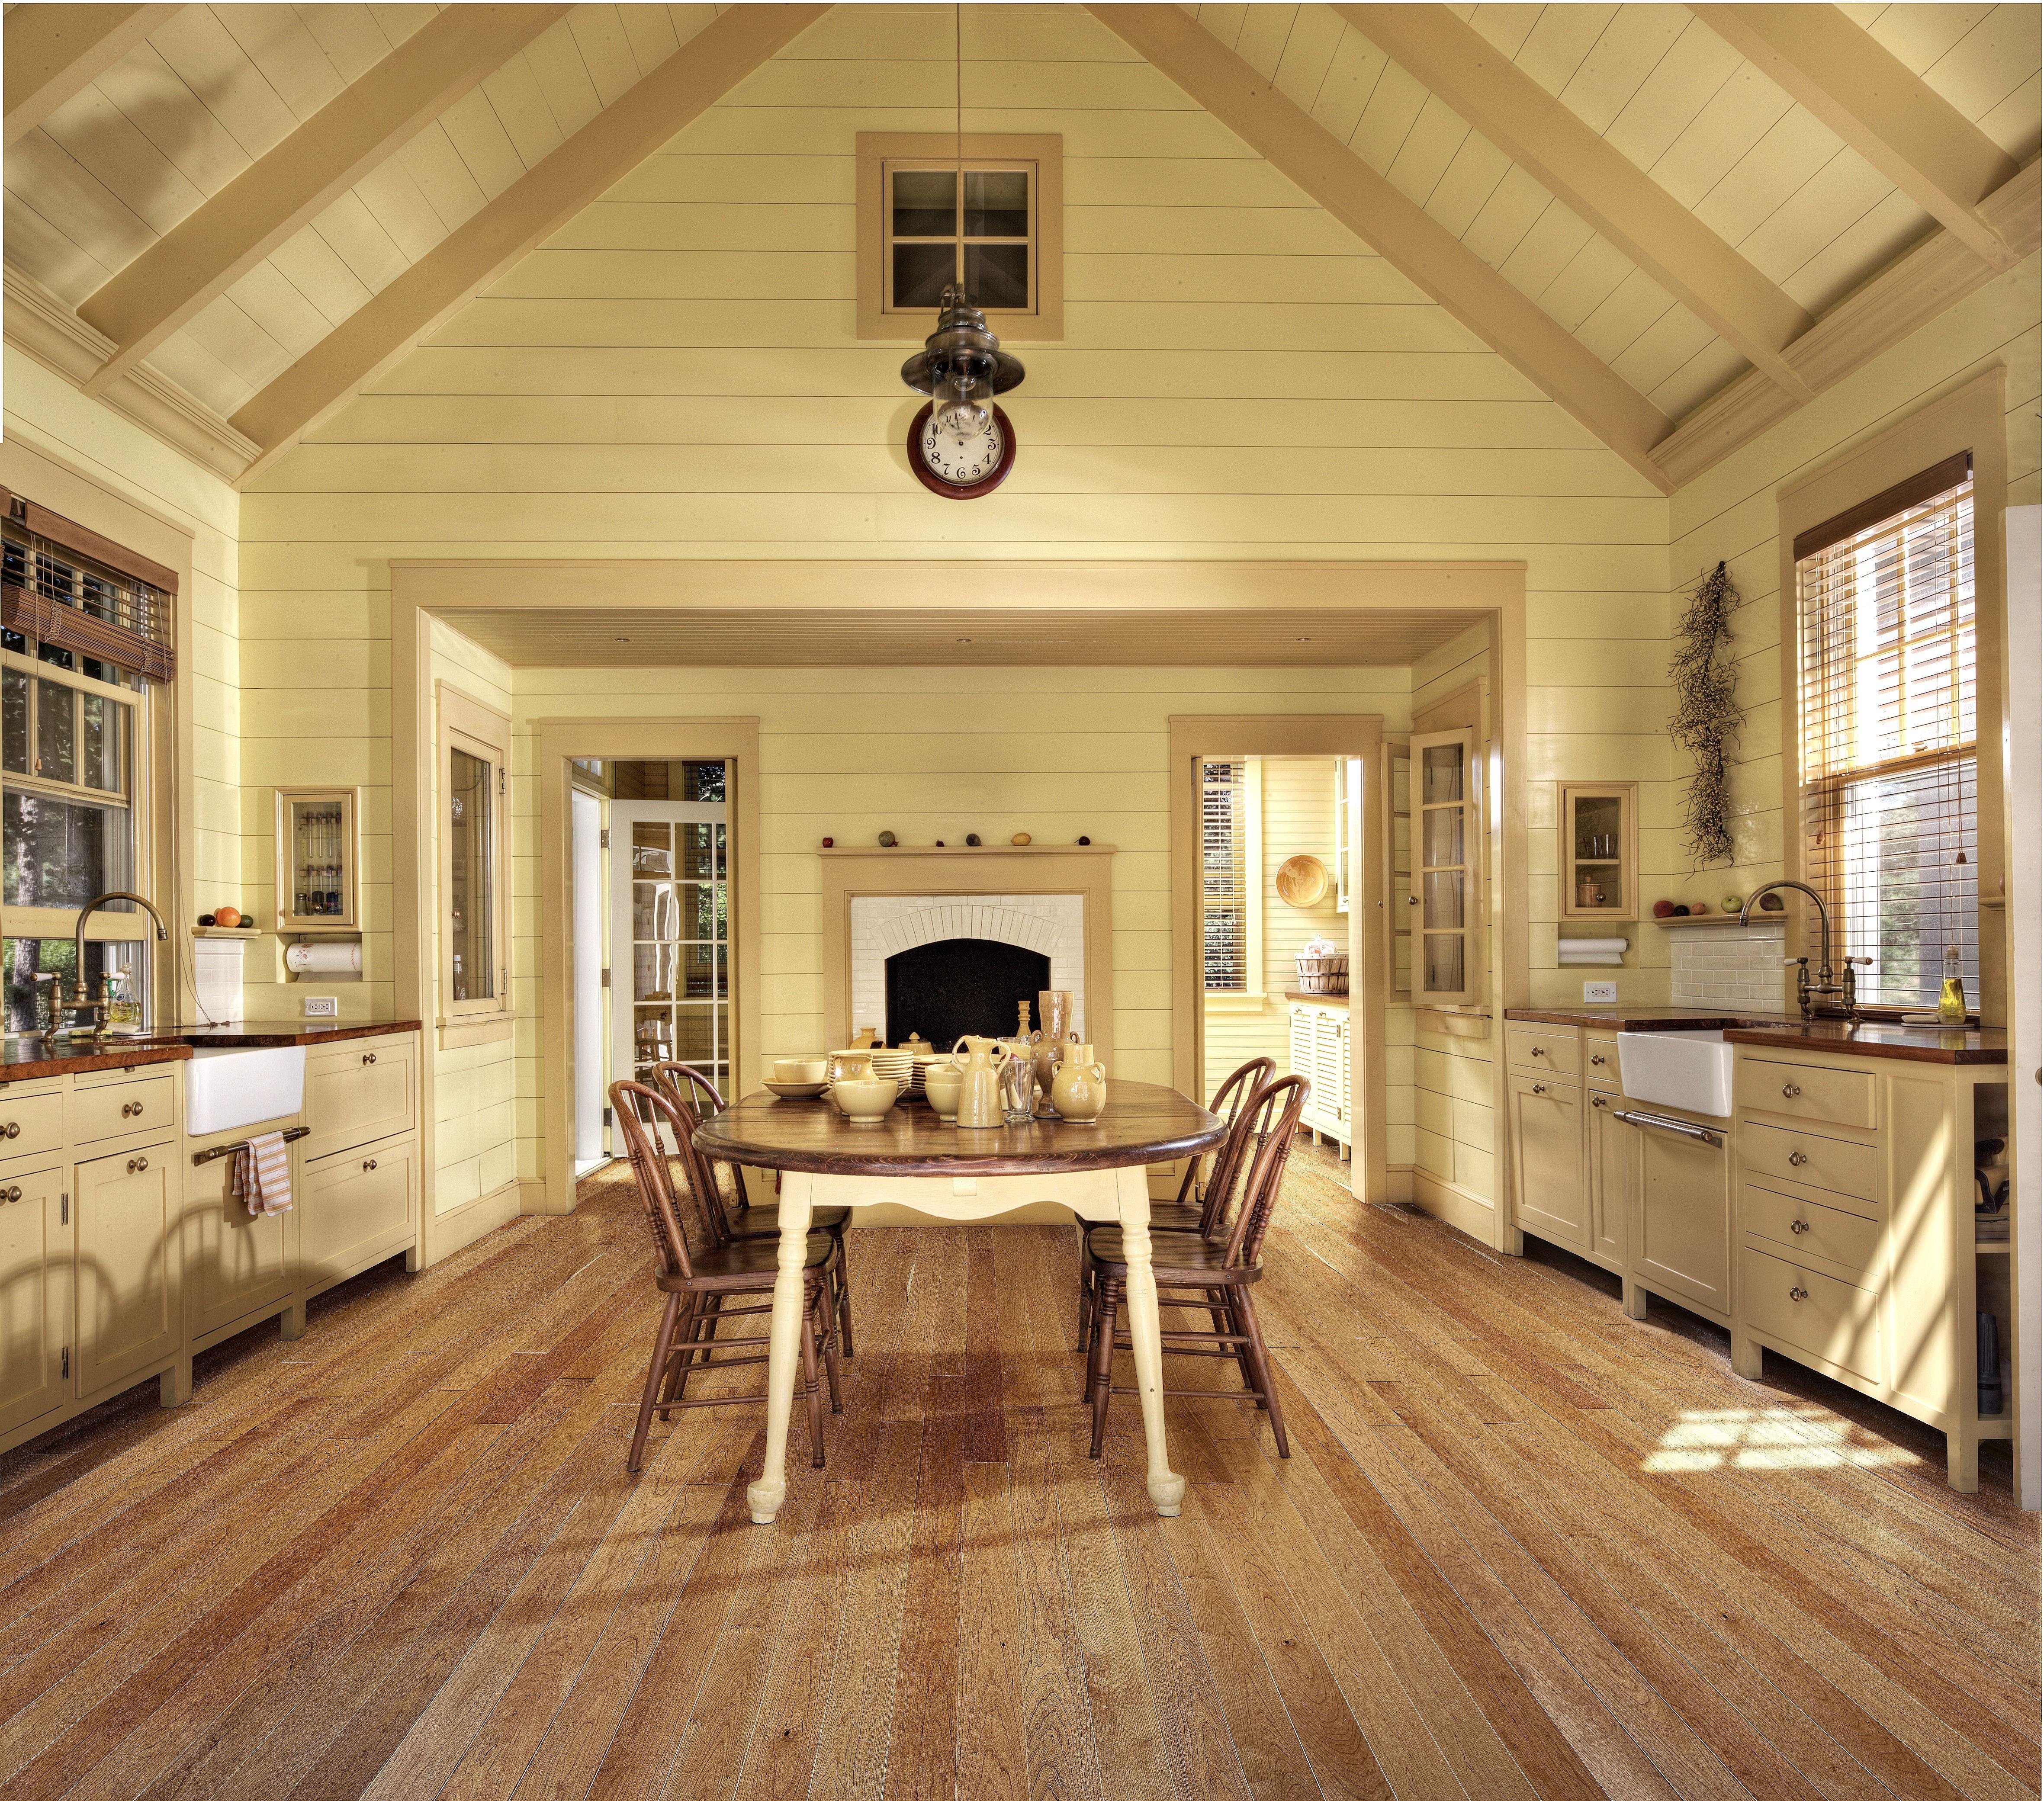 Open dining room with beautiful hardwood flooring